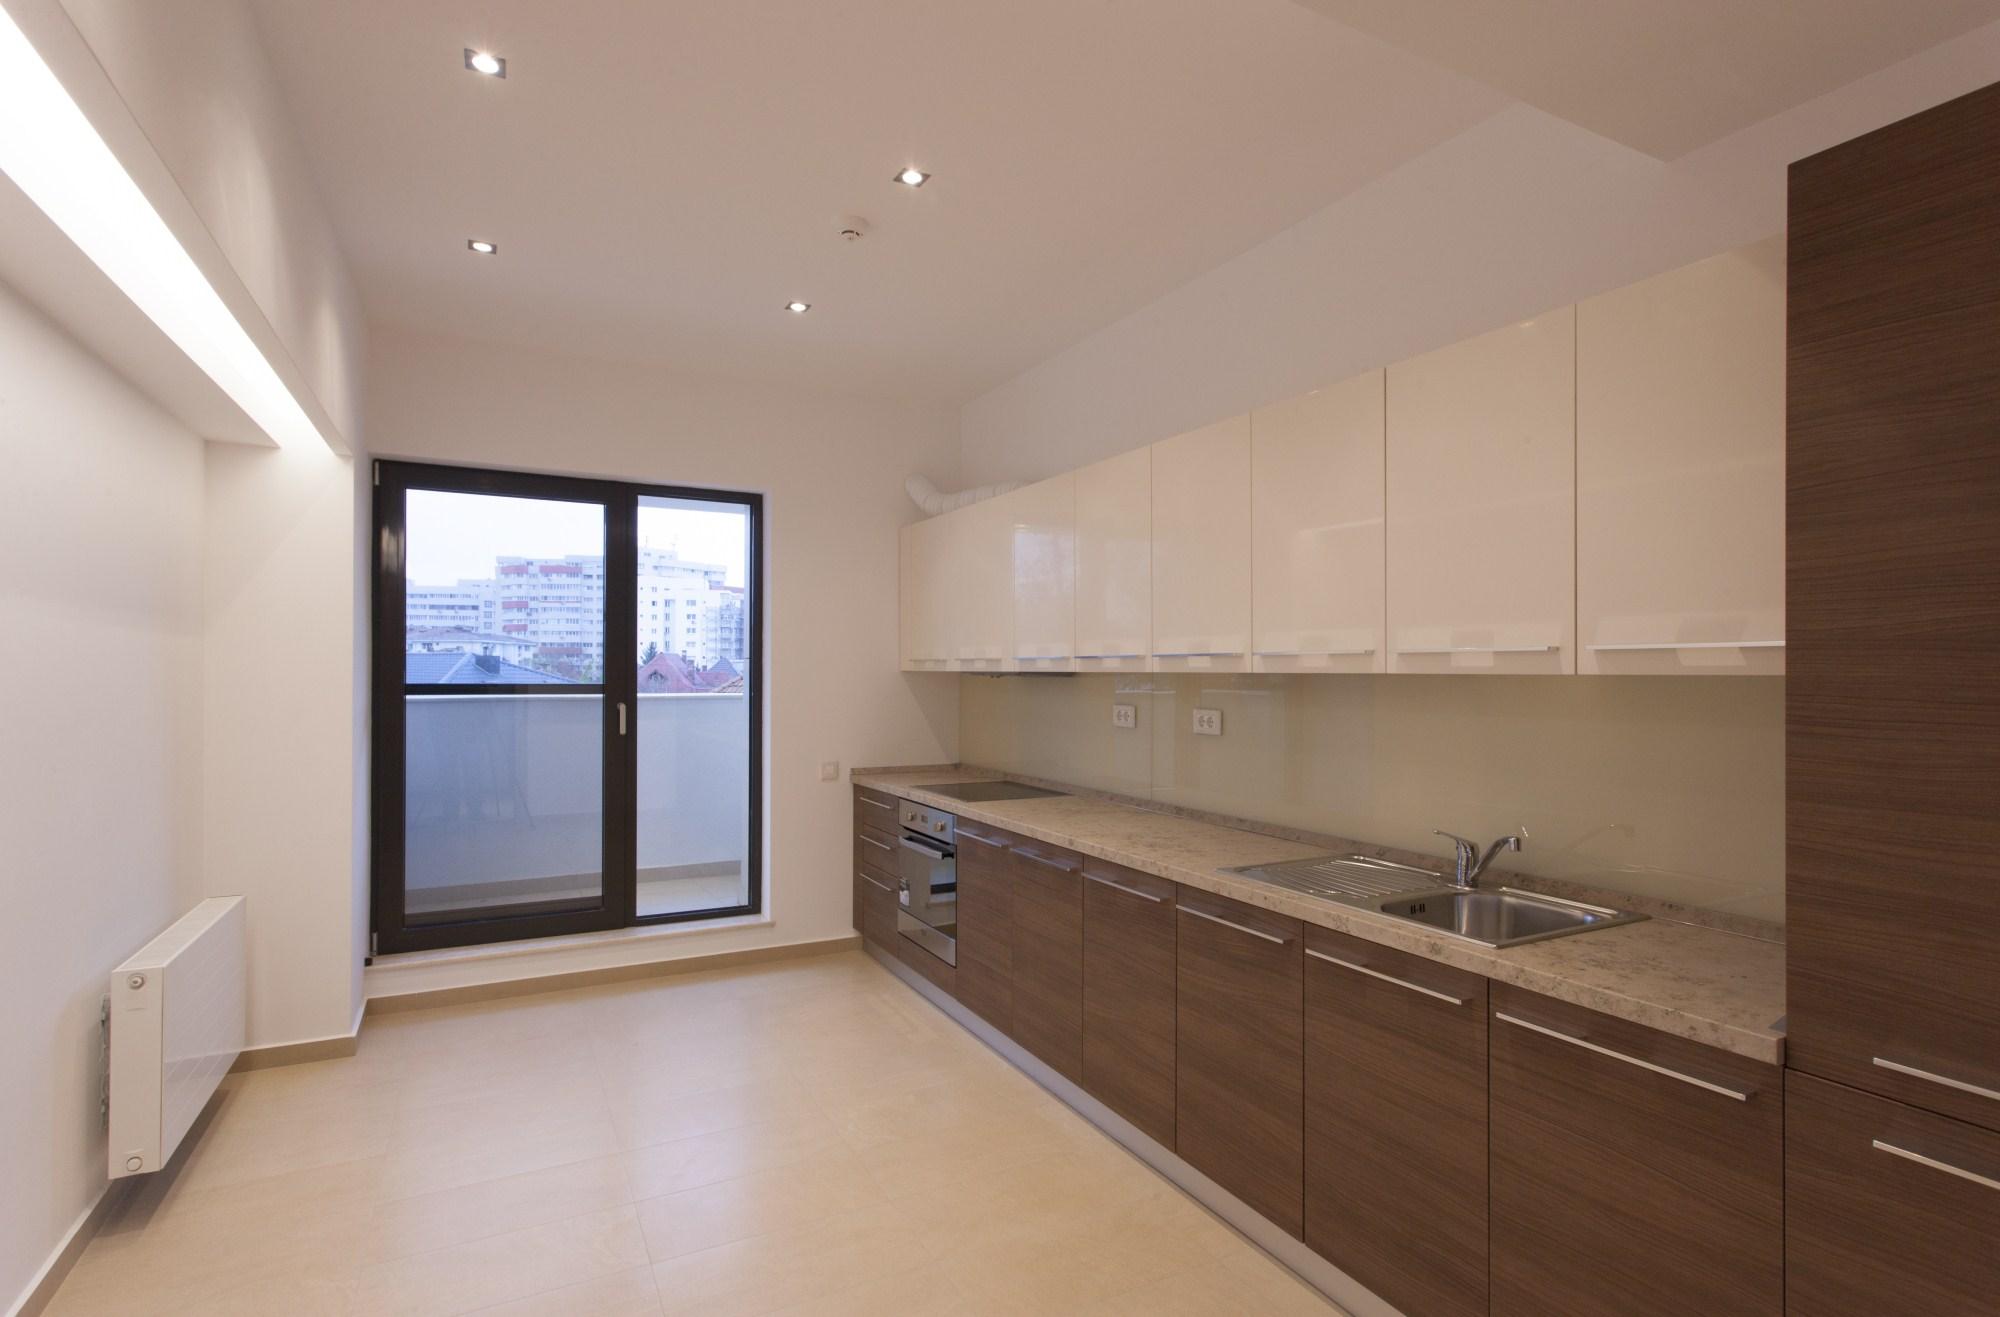 https://nbc-arhitect.ro/wp-content/uploads/2020/10/NBC-Arhitect-_-Petofi-Sandor-_-Housing-_-interior-design-_-kitchen_3.jpg